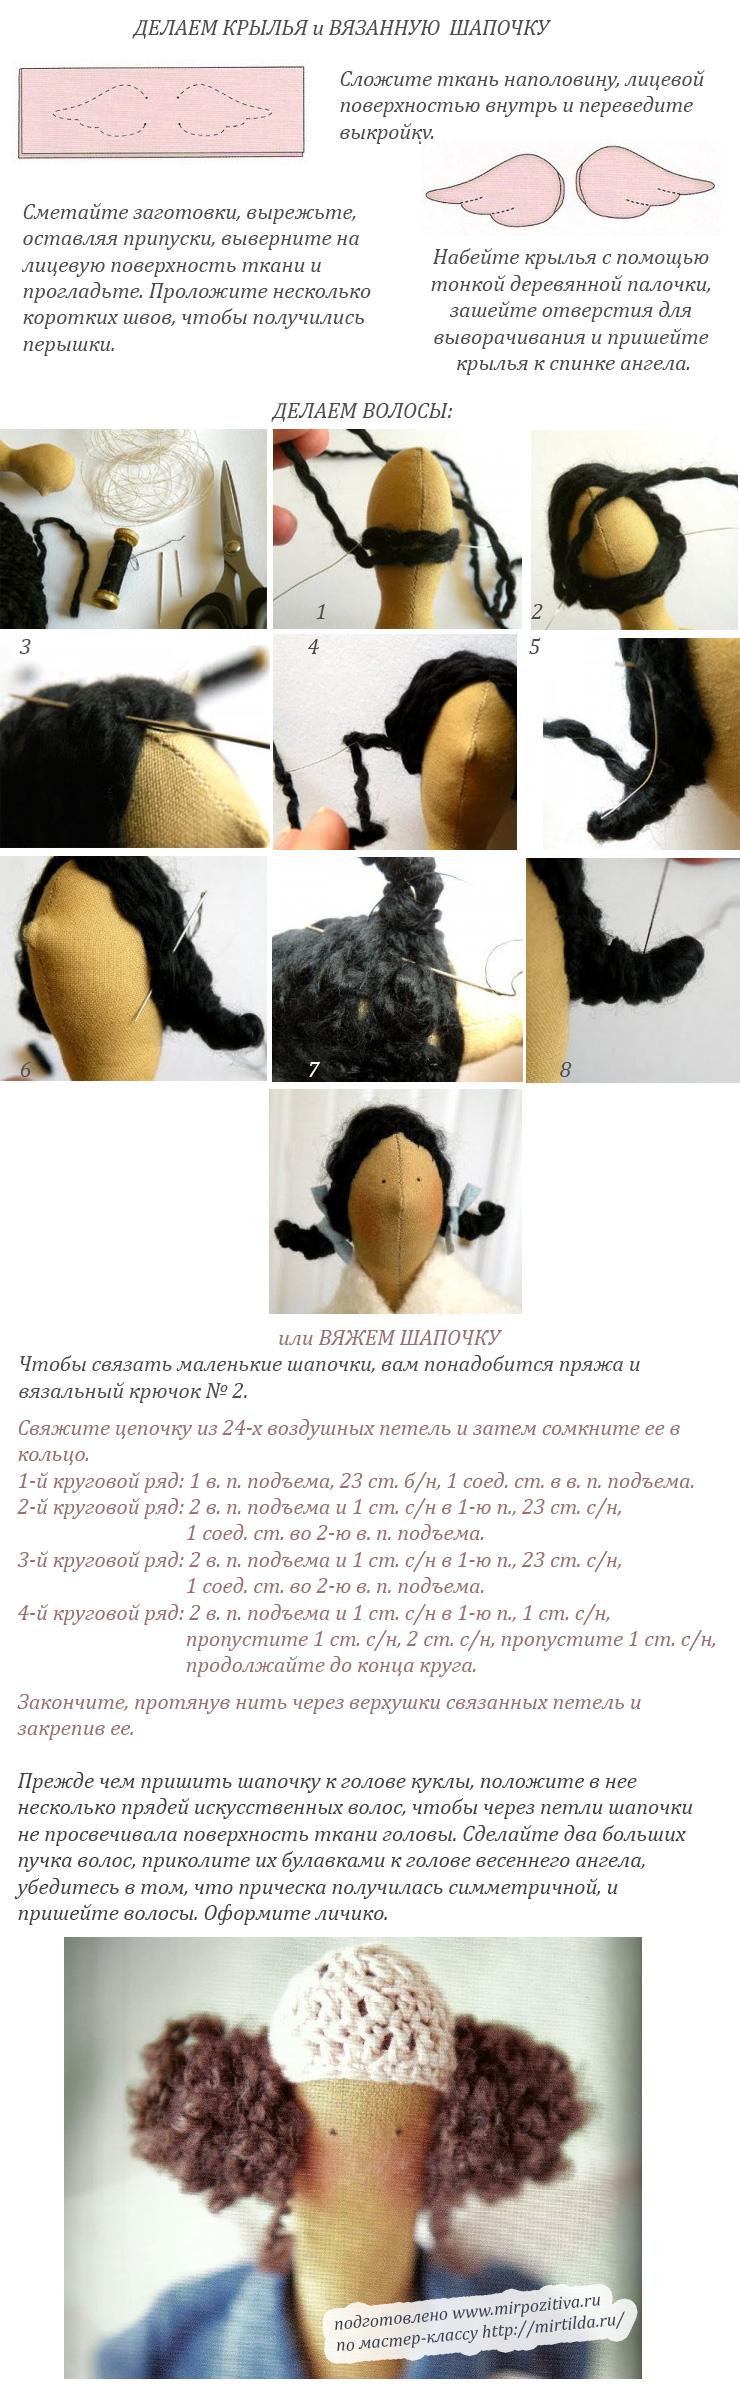 крылья для куклы, шапочка и волосы